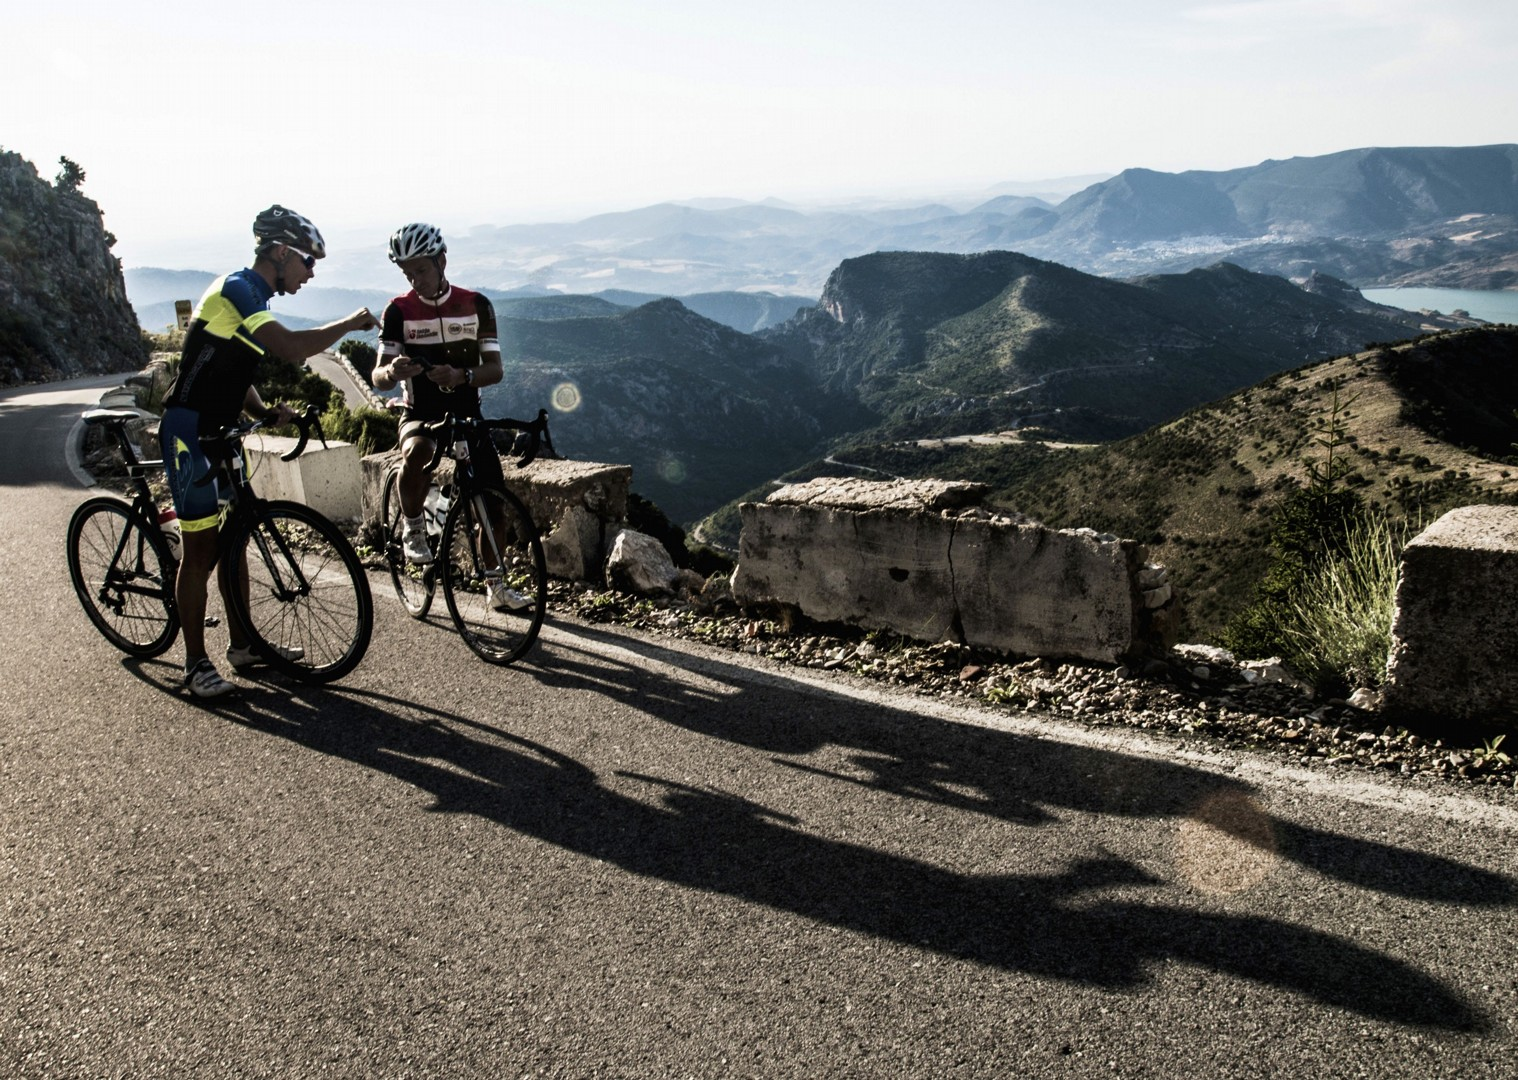 ronda5.jpg - Southern Spain - Roads of Ronda - Road Cycling